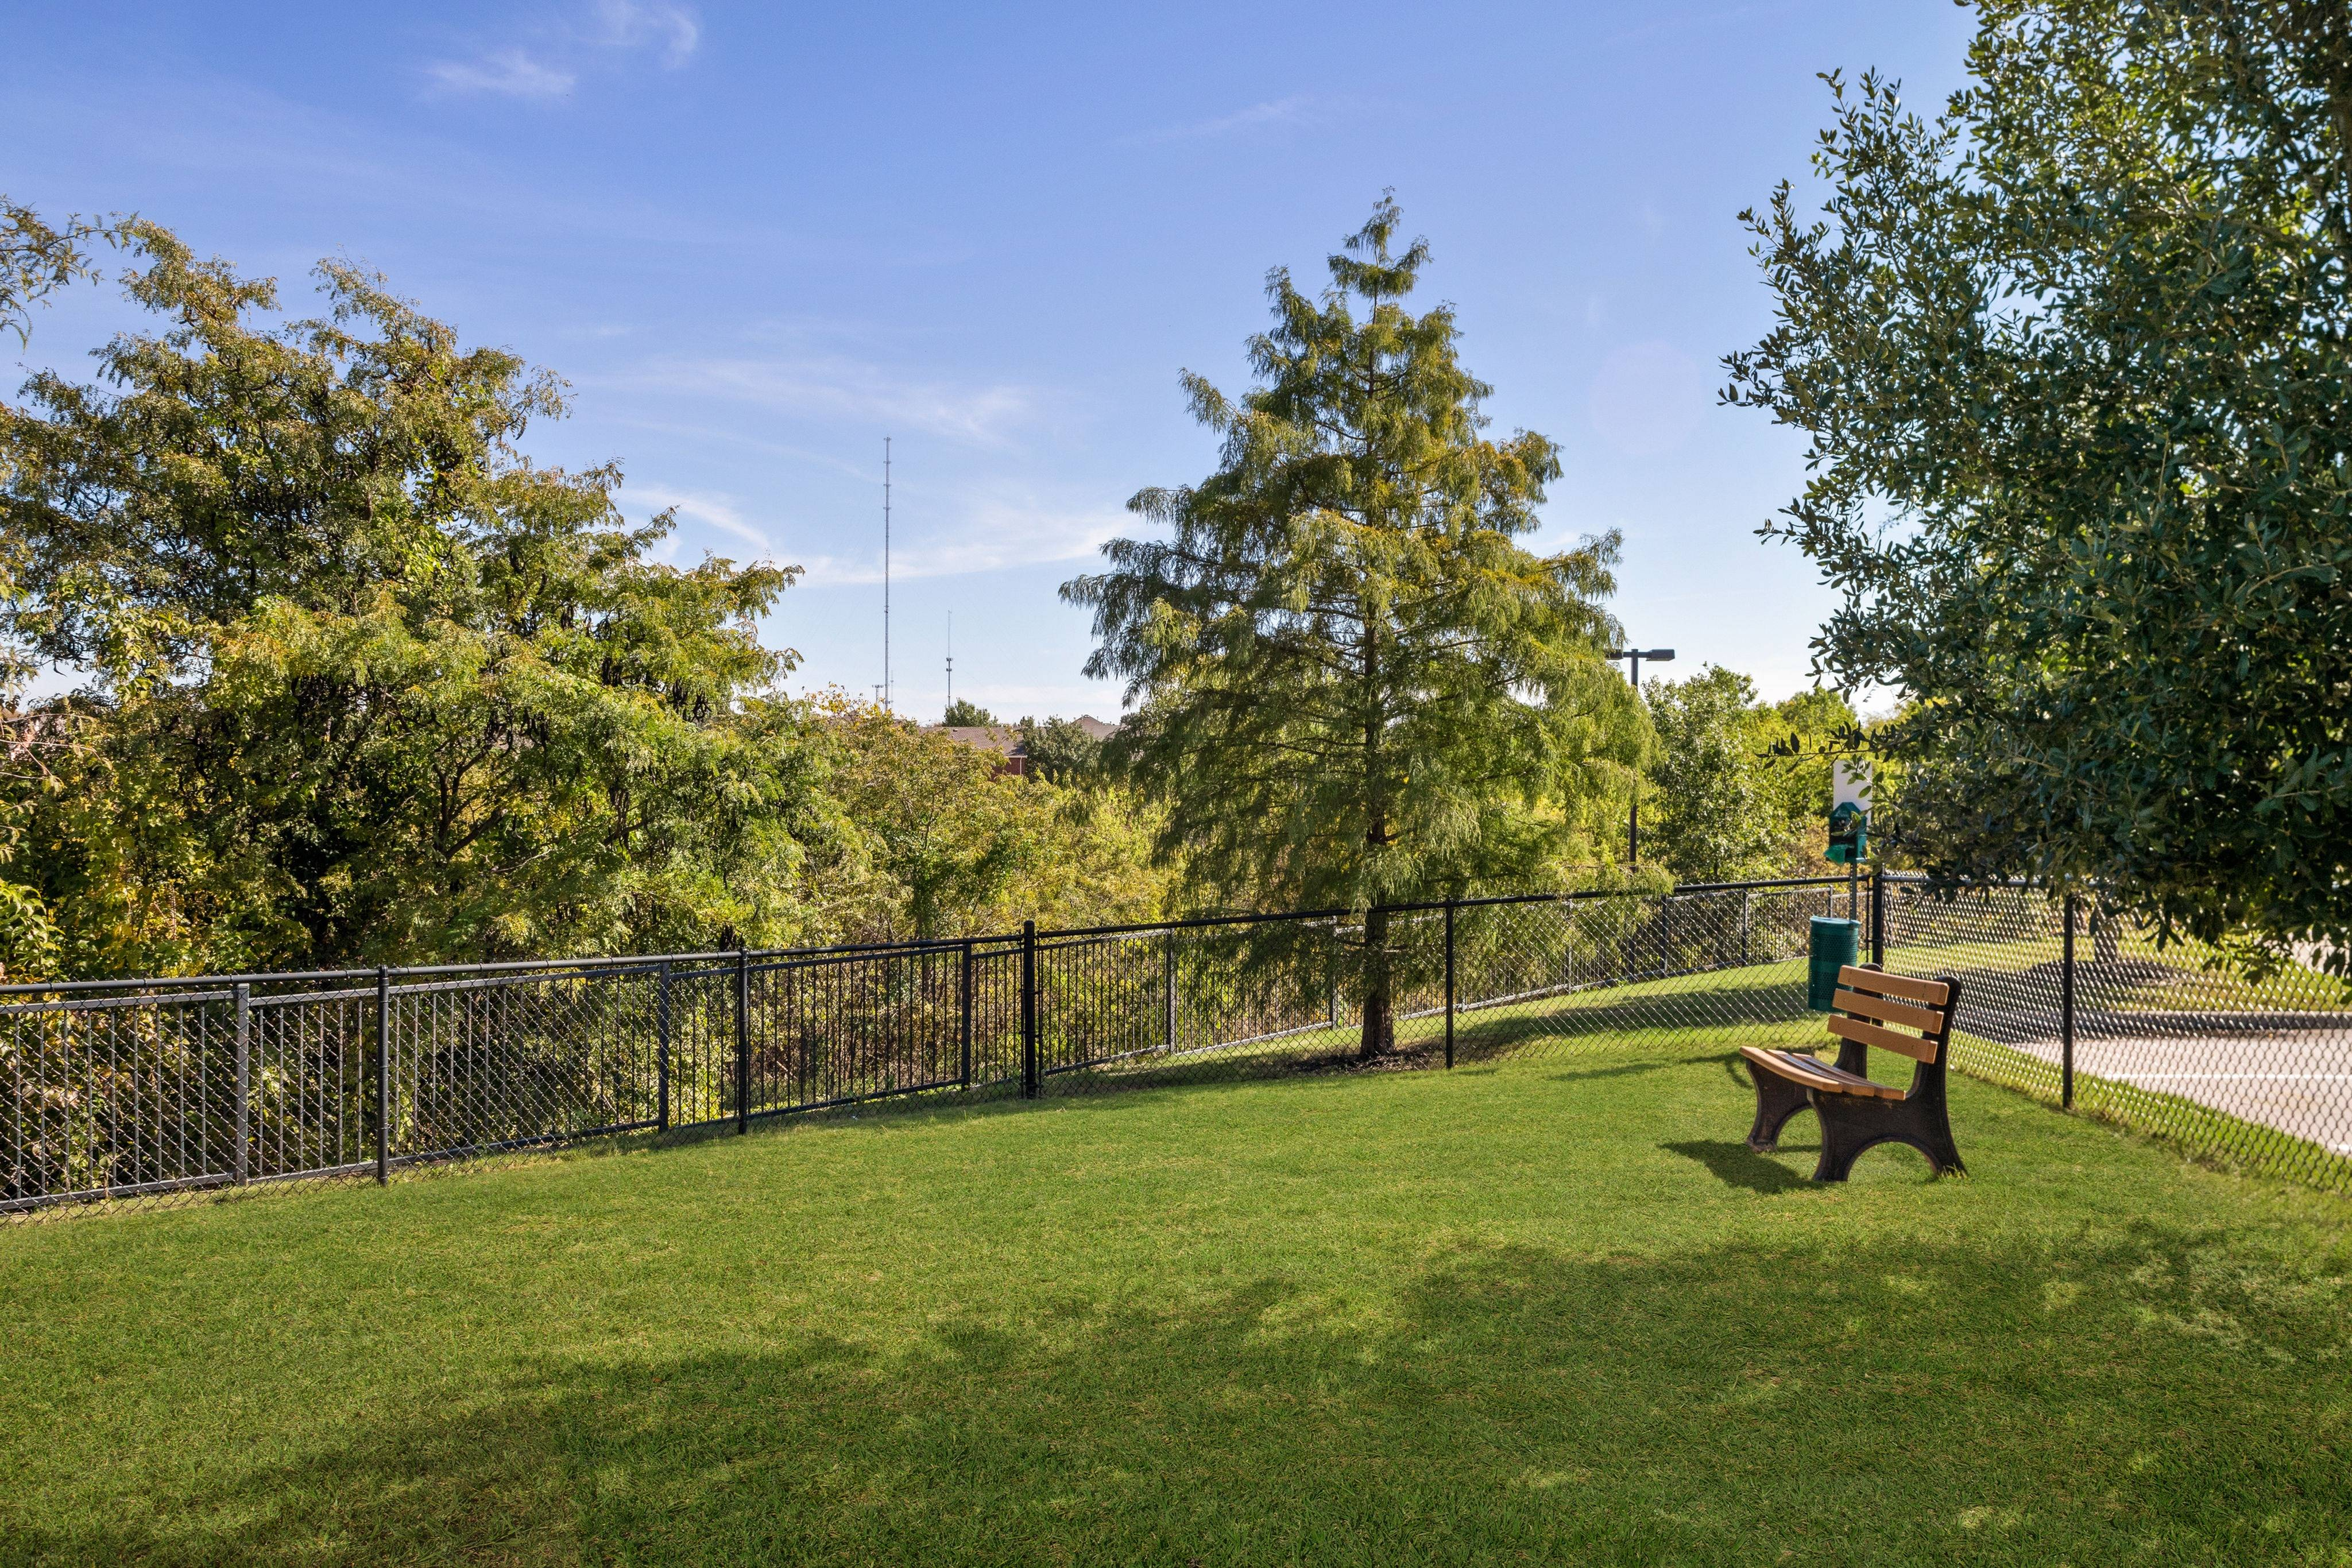 Private Off-Leash Dog Park